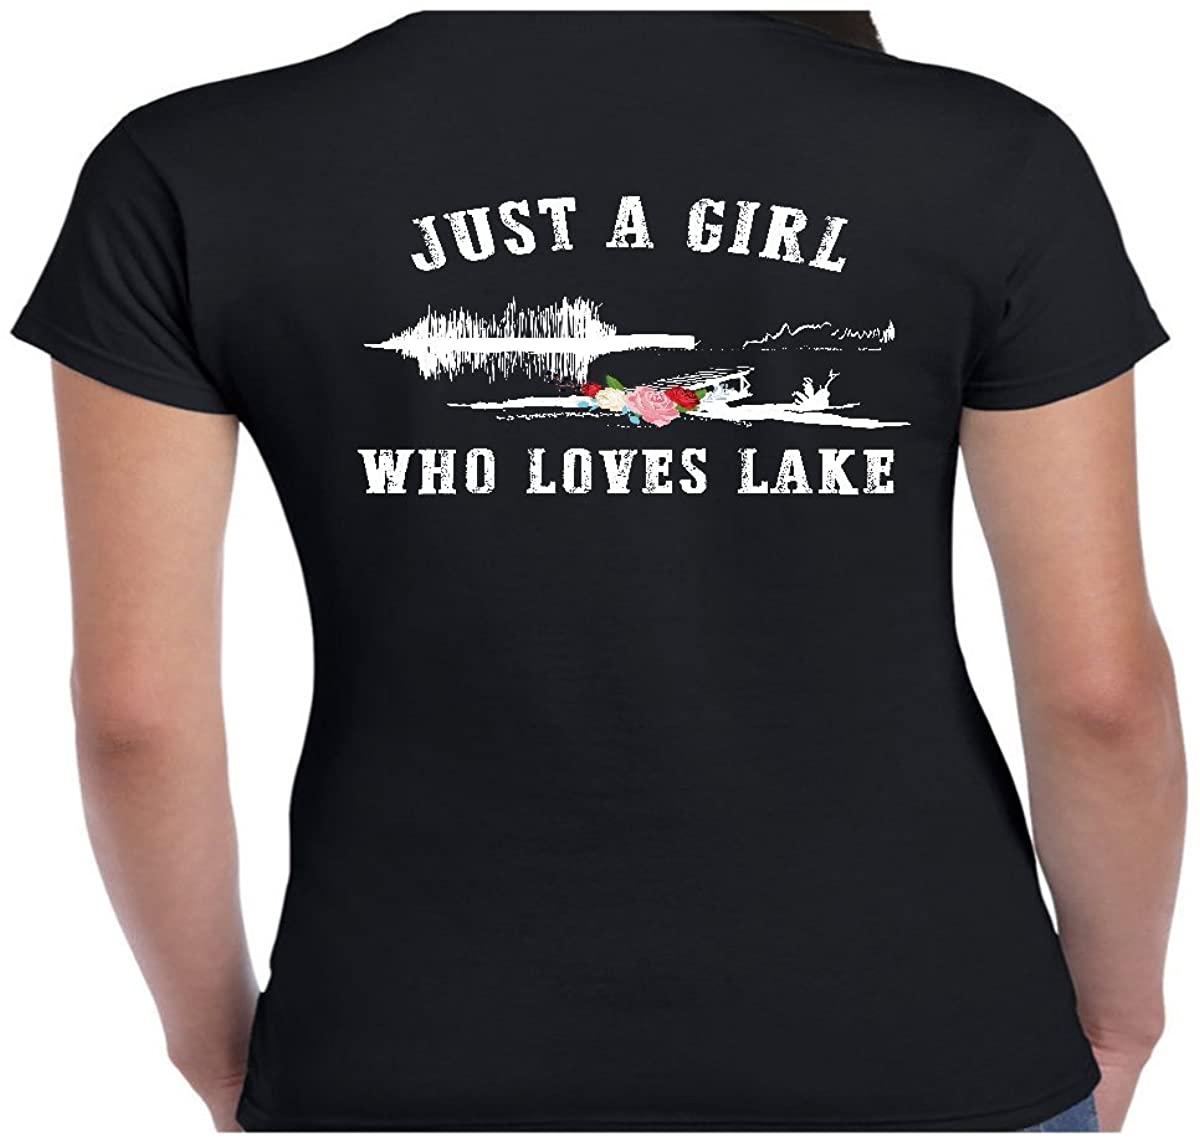 Women's Just a Girl who Loves Lake Shirt - Tshirt